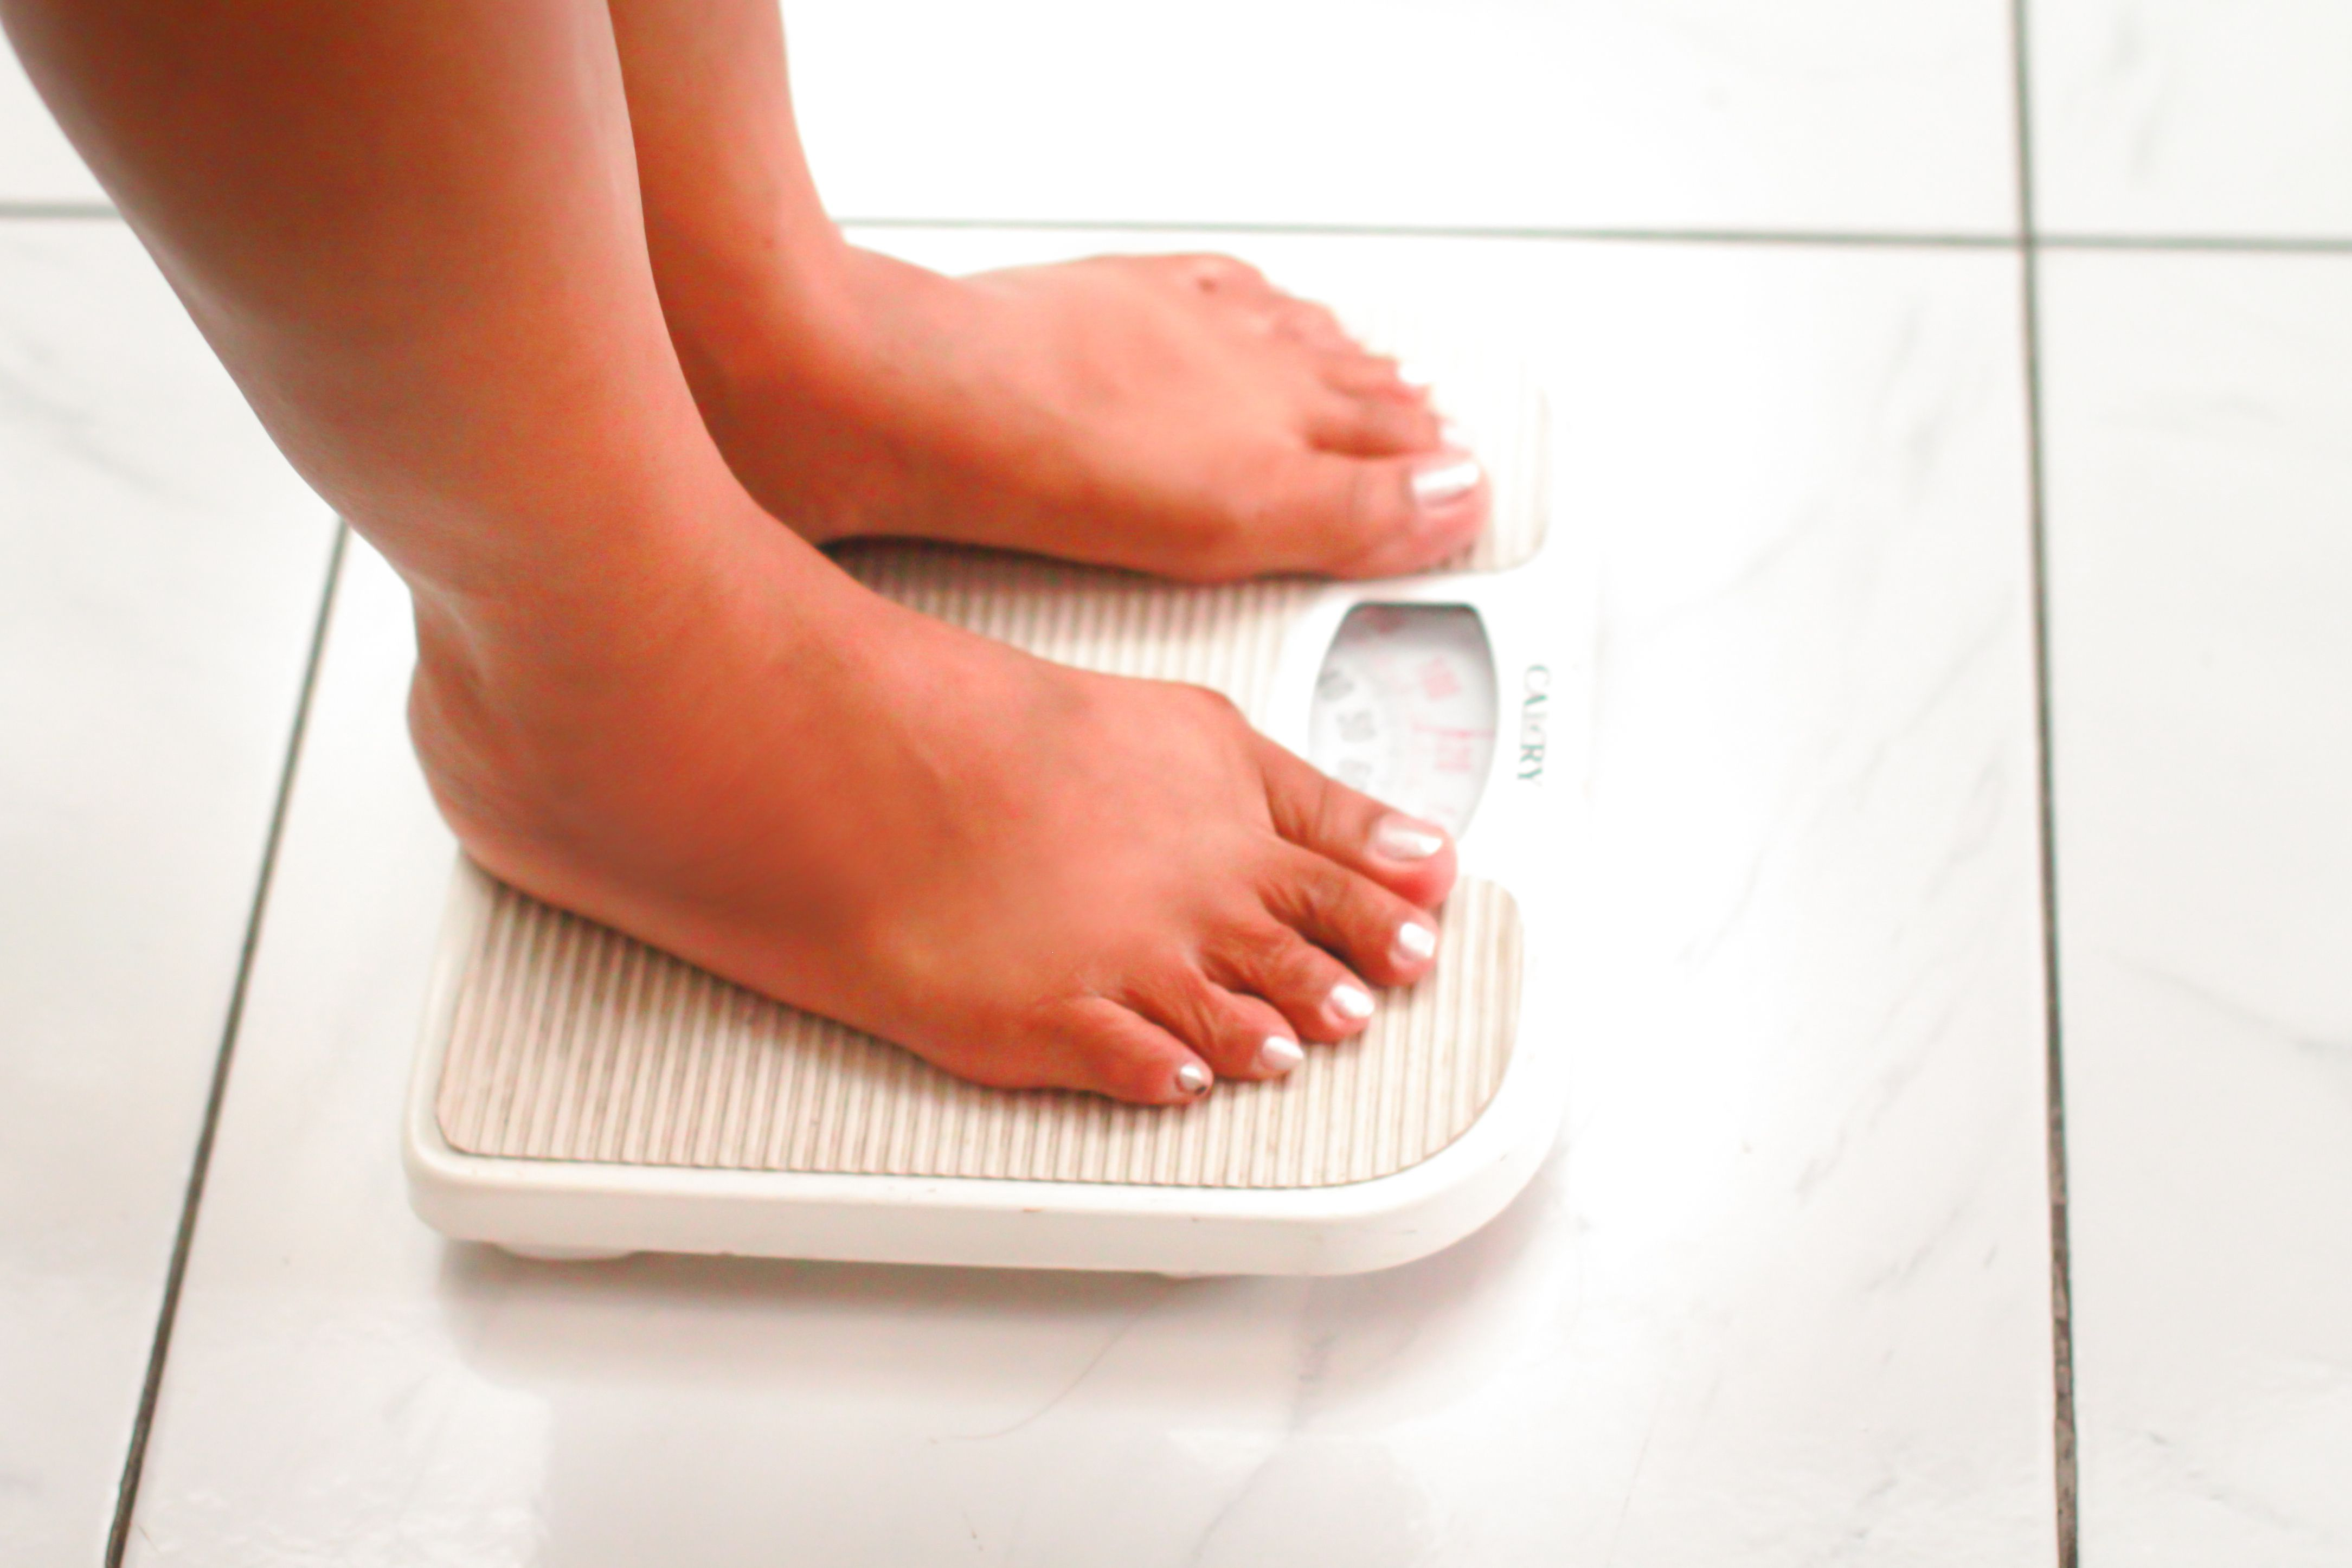 Gluteus maximus fat loss picture 8